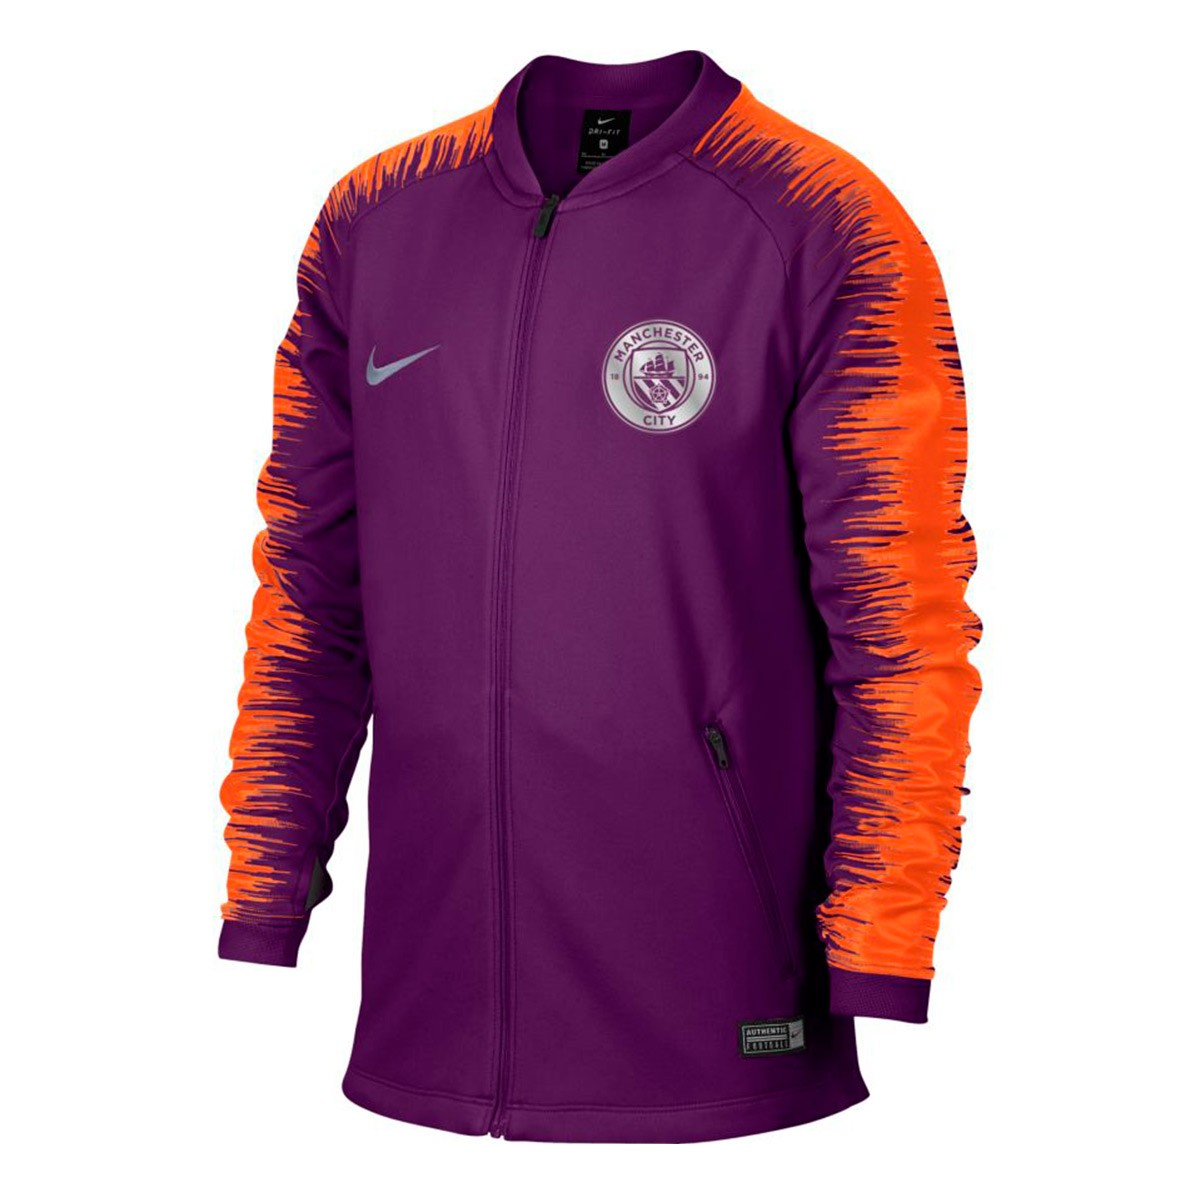 5e0e2c845 Jacket Nike Kids Manchester City FC 2018-2019 Night purple-Safety ...